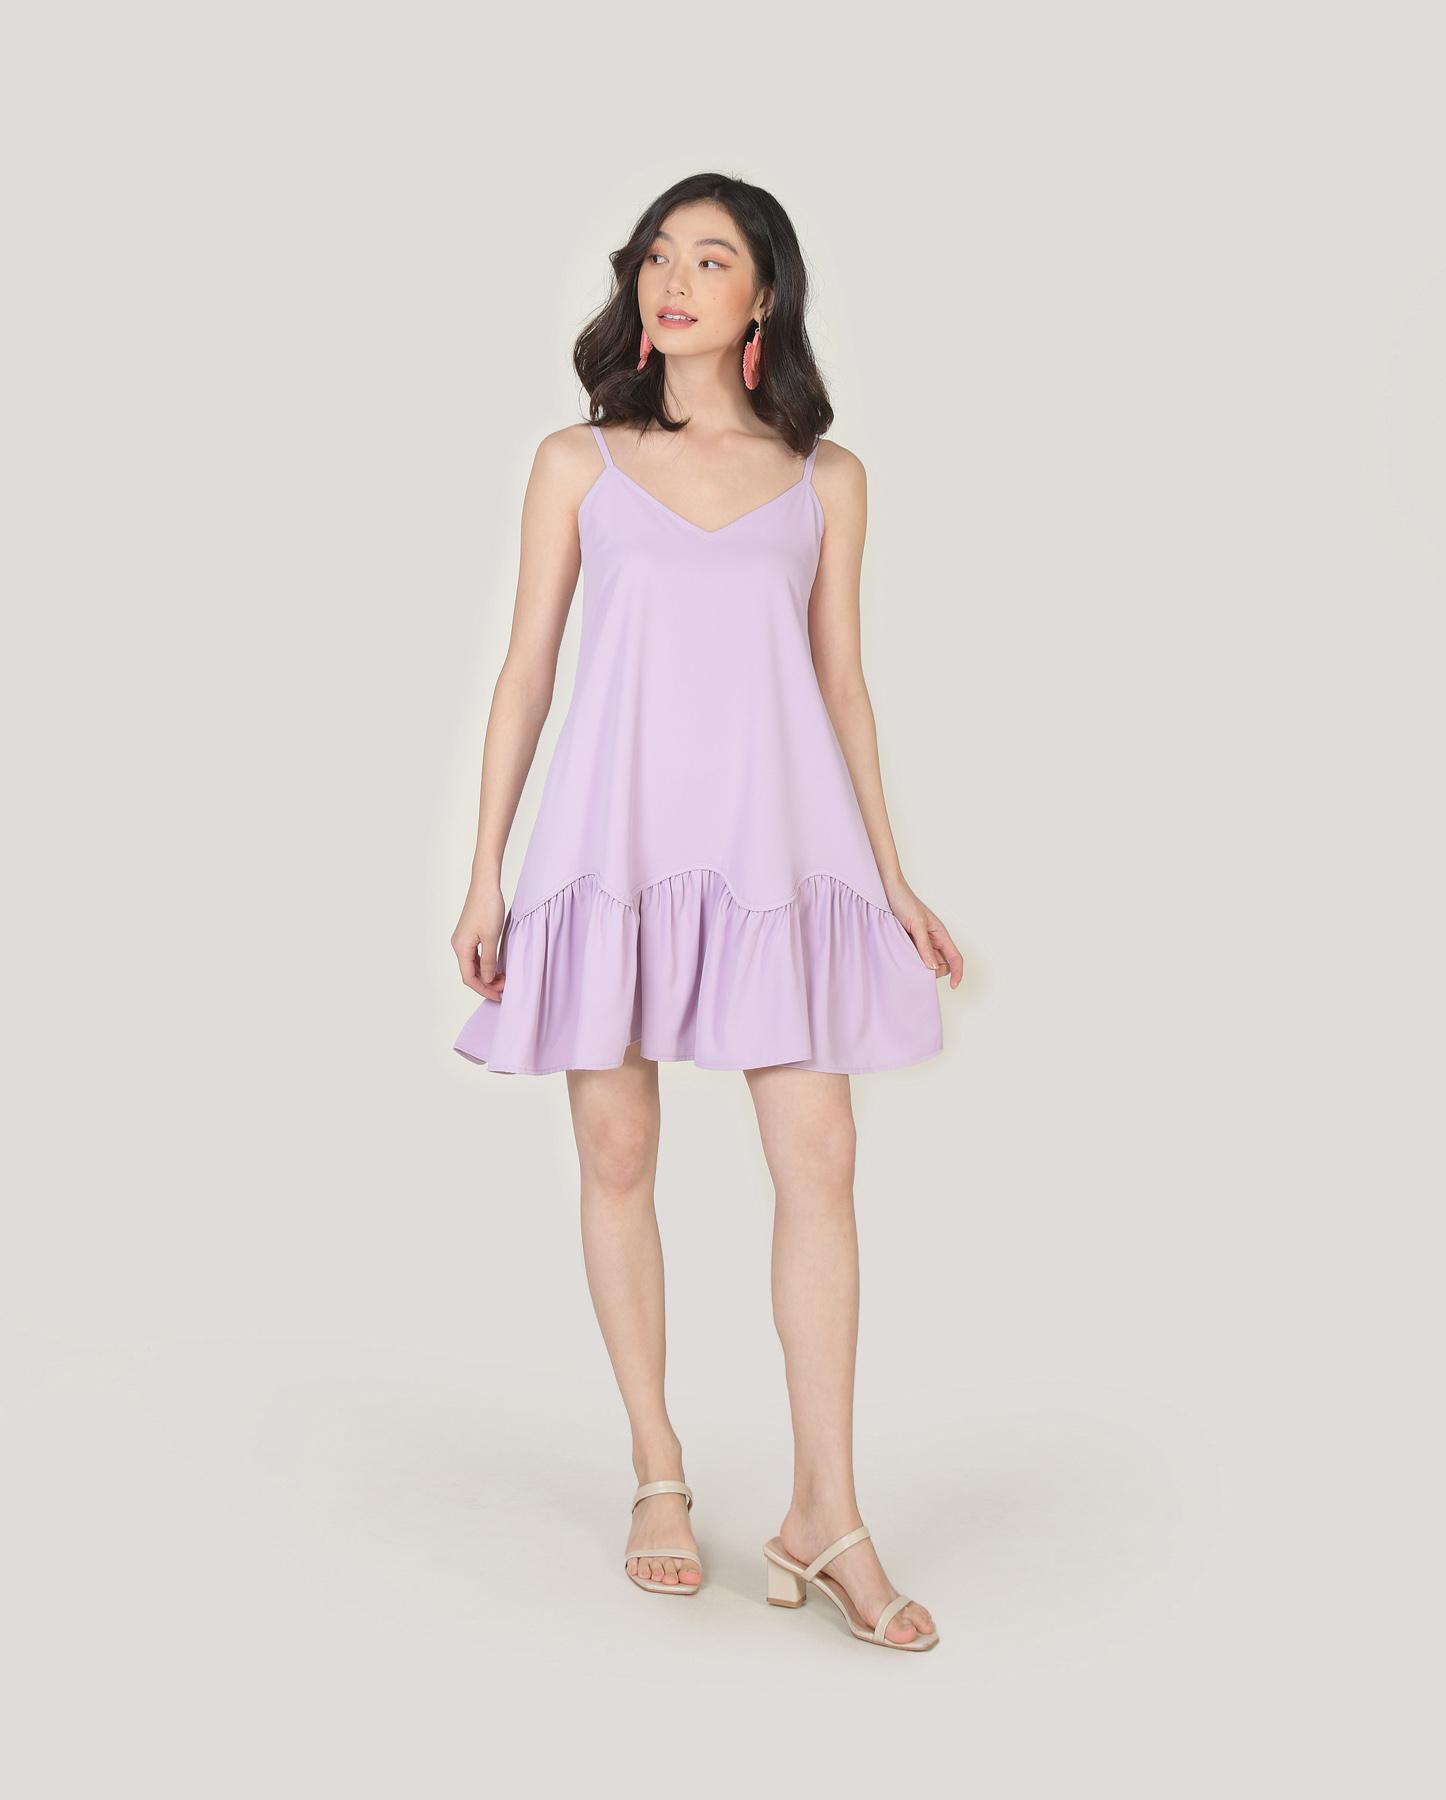 elyse-drop-hem-dress-lilac-1